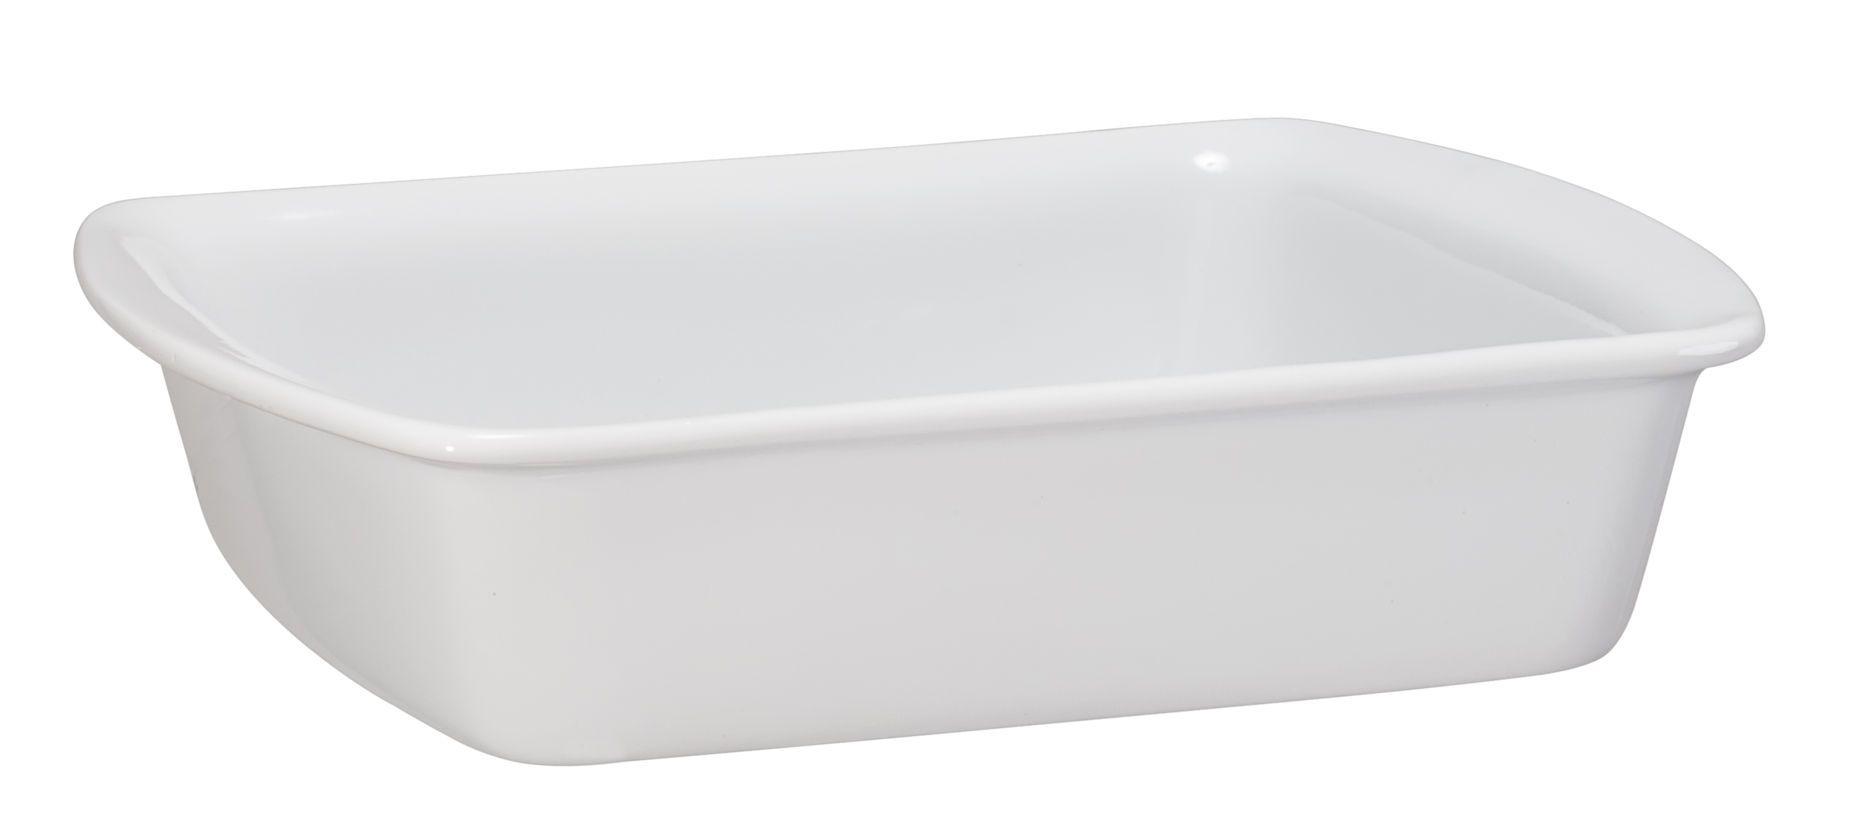 Assadeira Retangular 23x18cm Cerâmica Branca